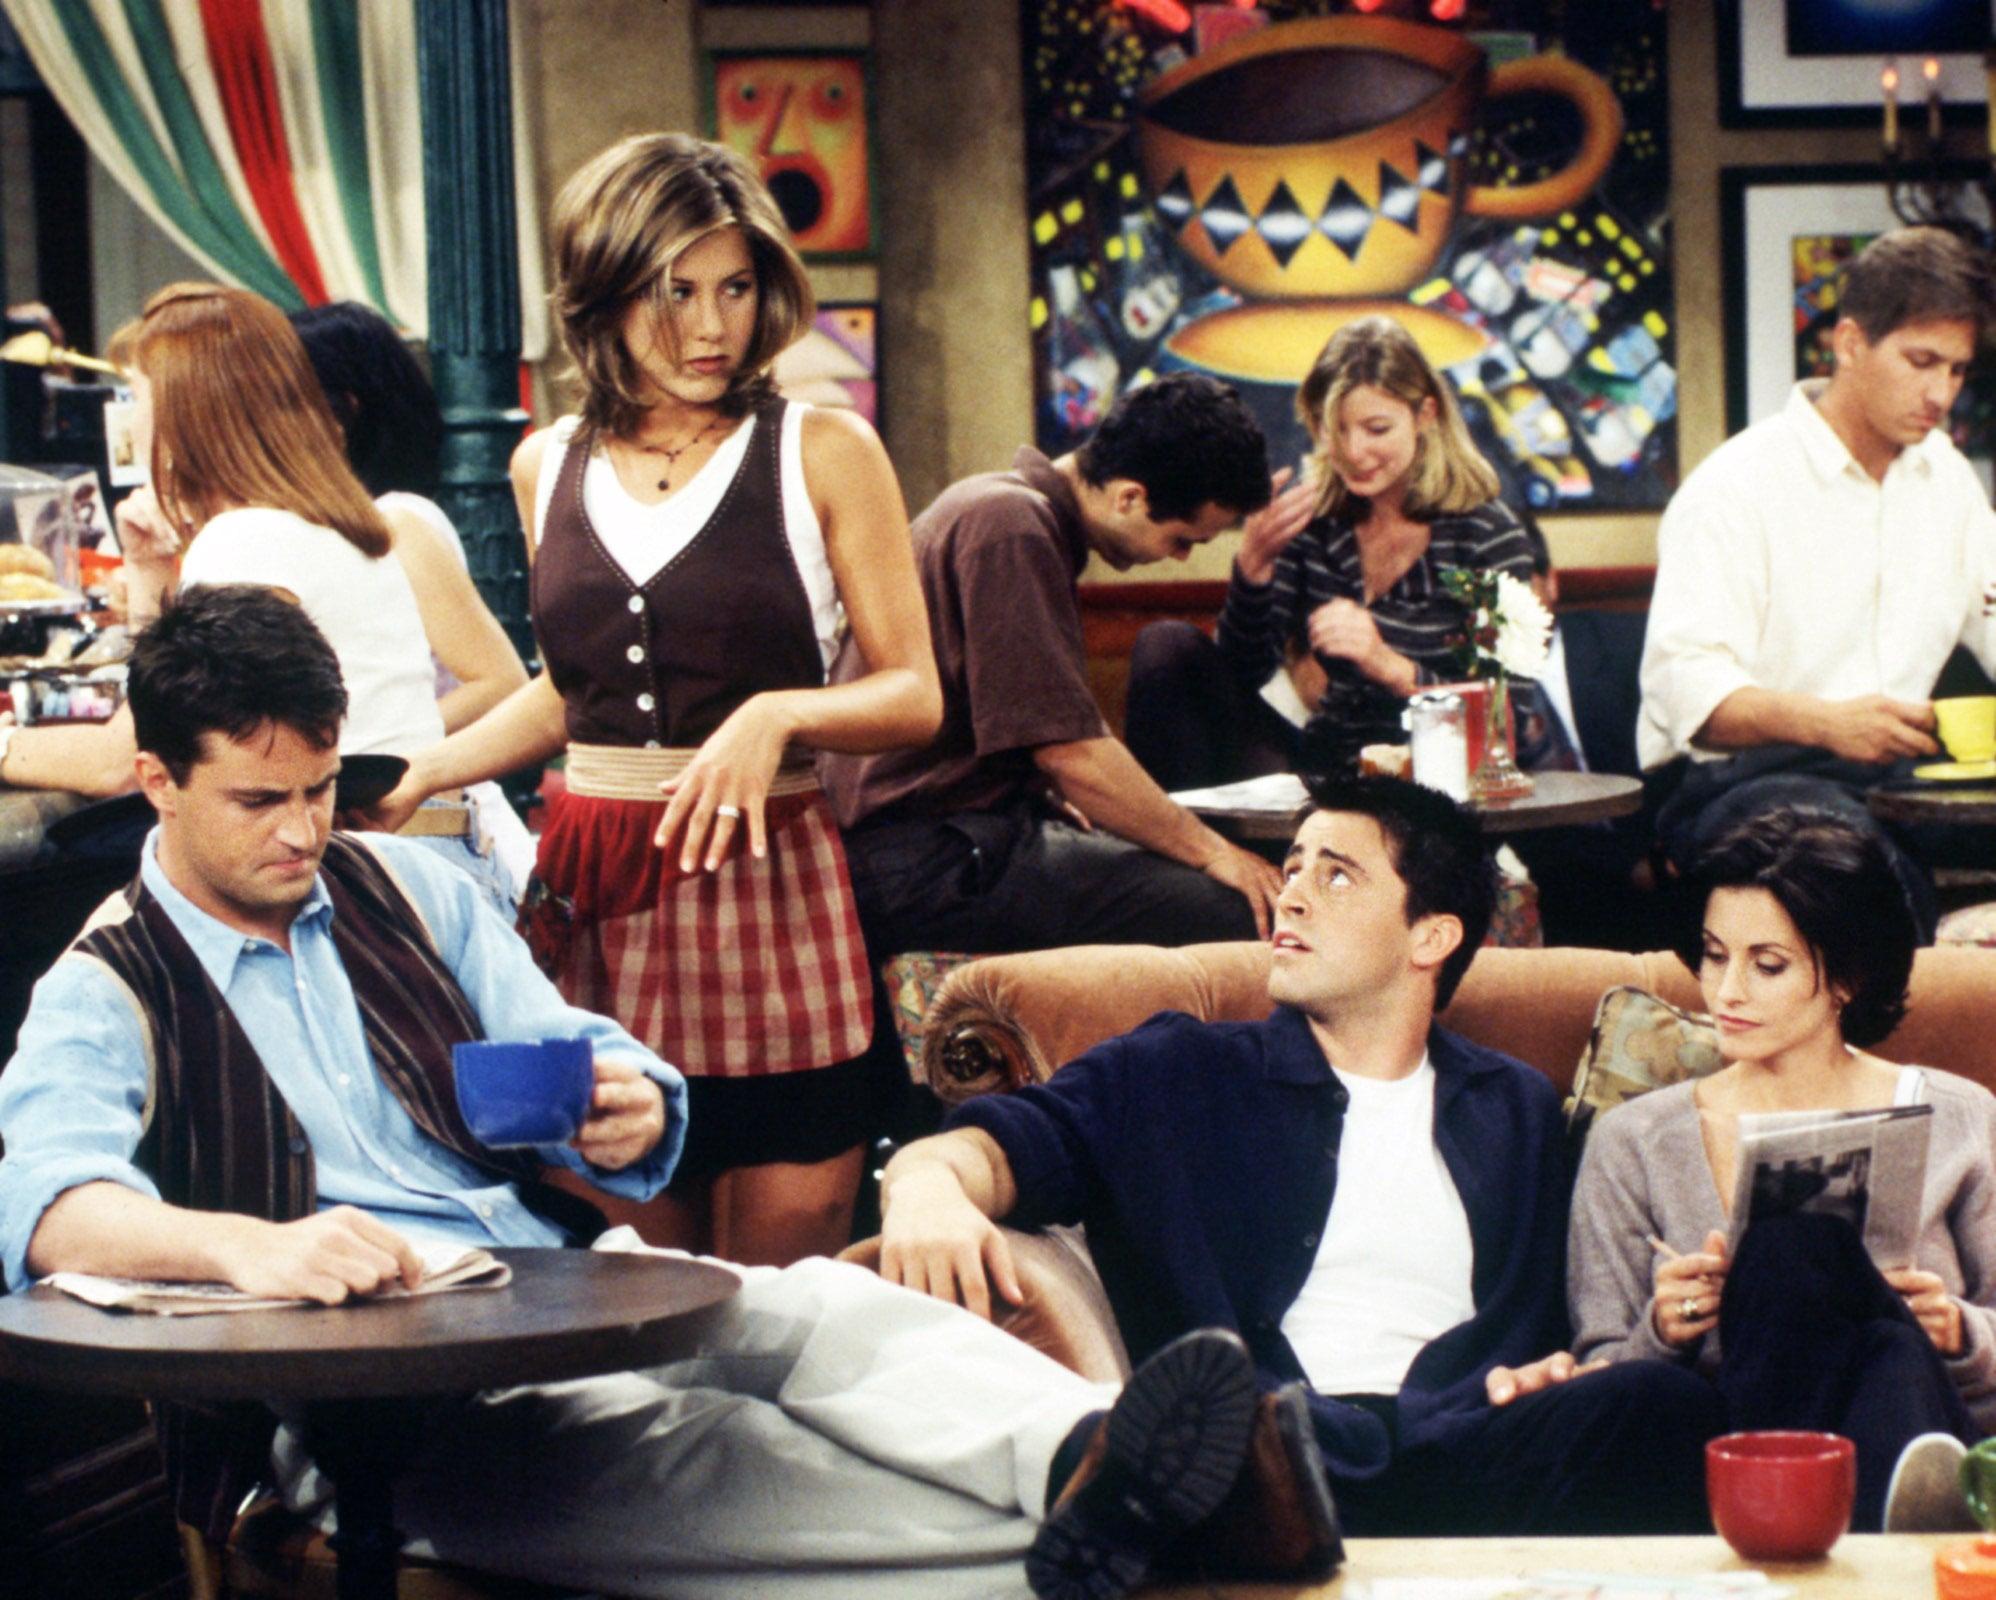 FRIENDS, Matthew Perry, Jennifer Aniston, Matt LeBlanc, Courteney Cox (1996-Season 2), 1994-2004, (c)Warner Bros. Television/courtesy Everett Collection